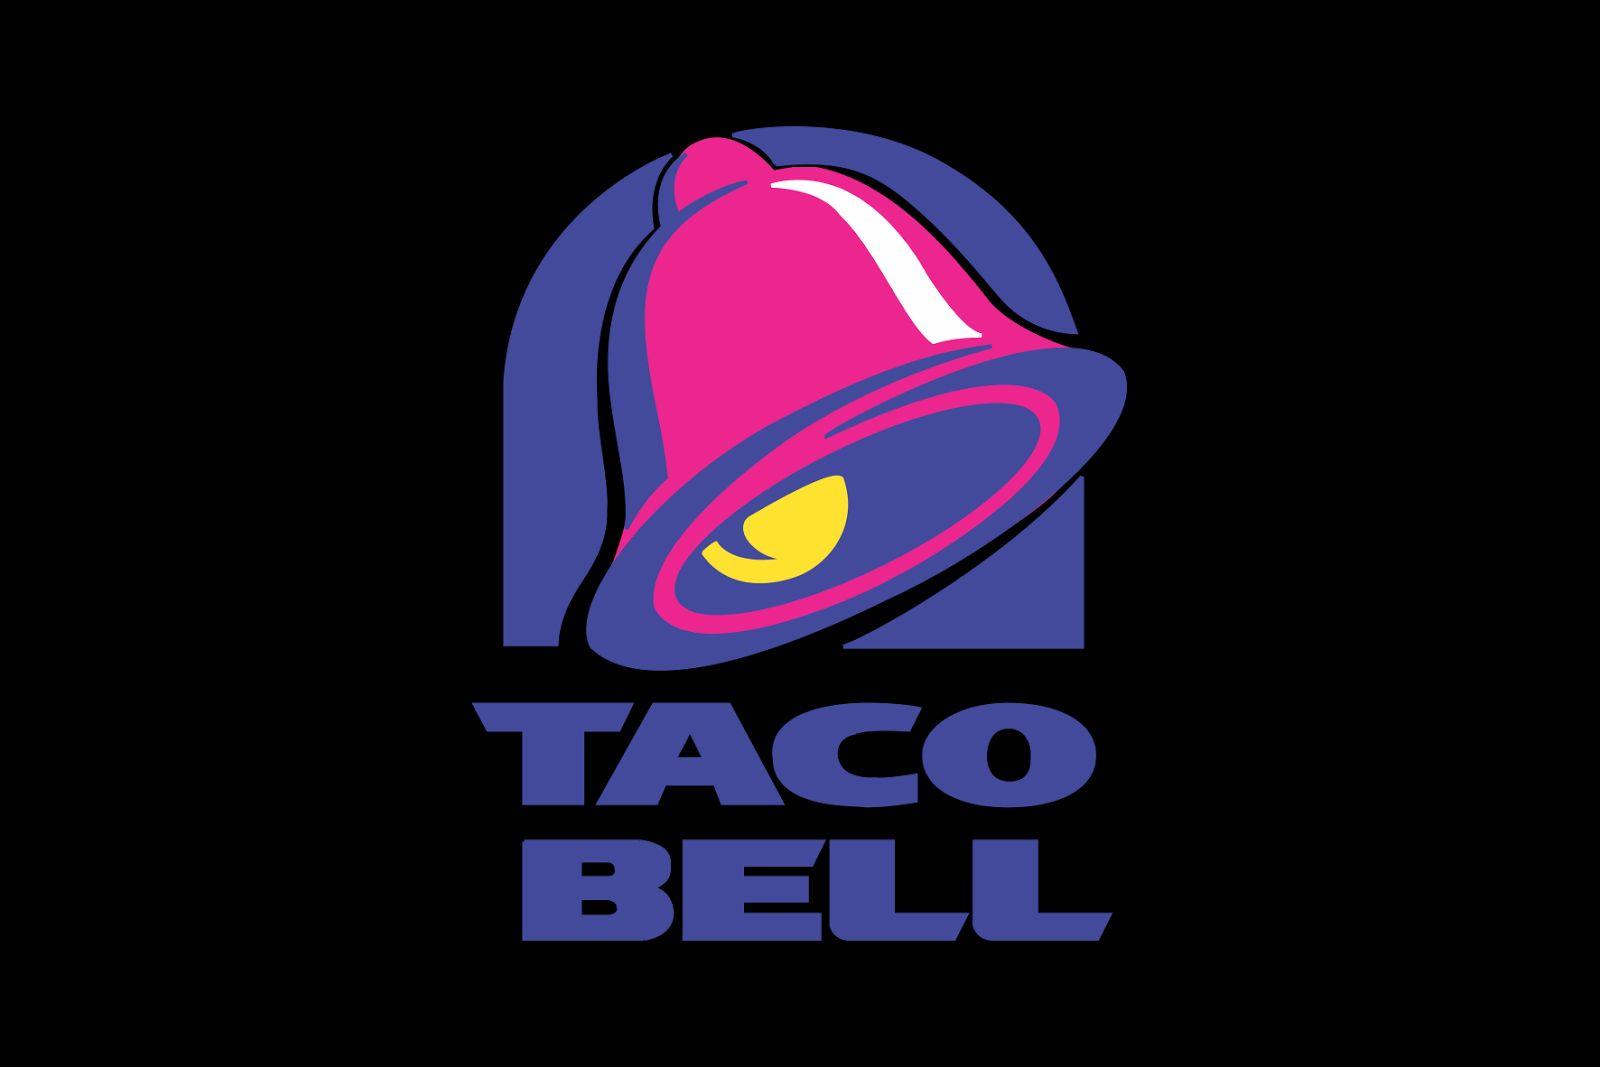 Emblem Taco Bell Taco Bell Logo Taco Bell Tacos